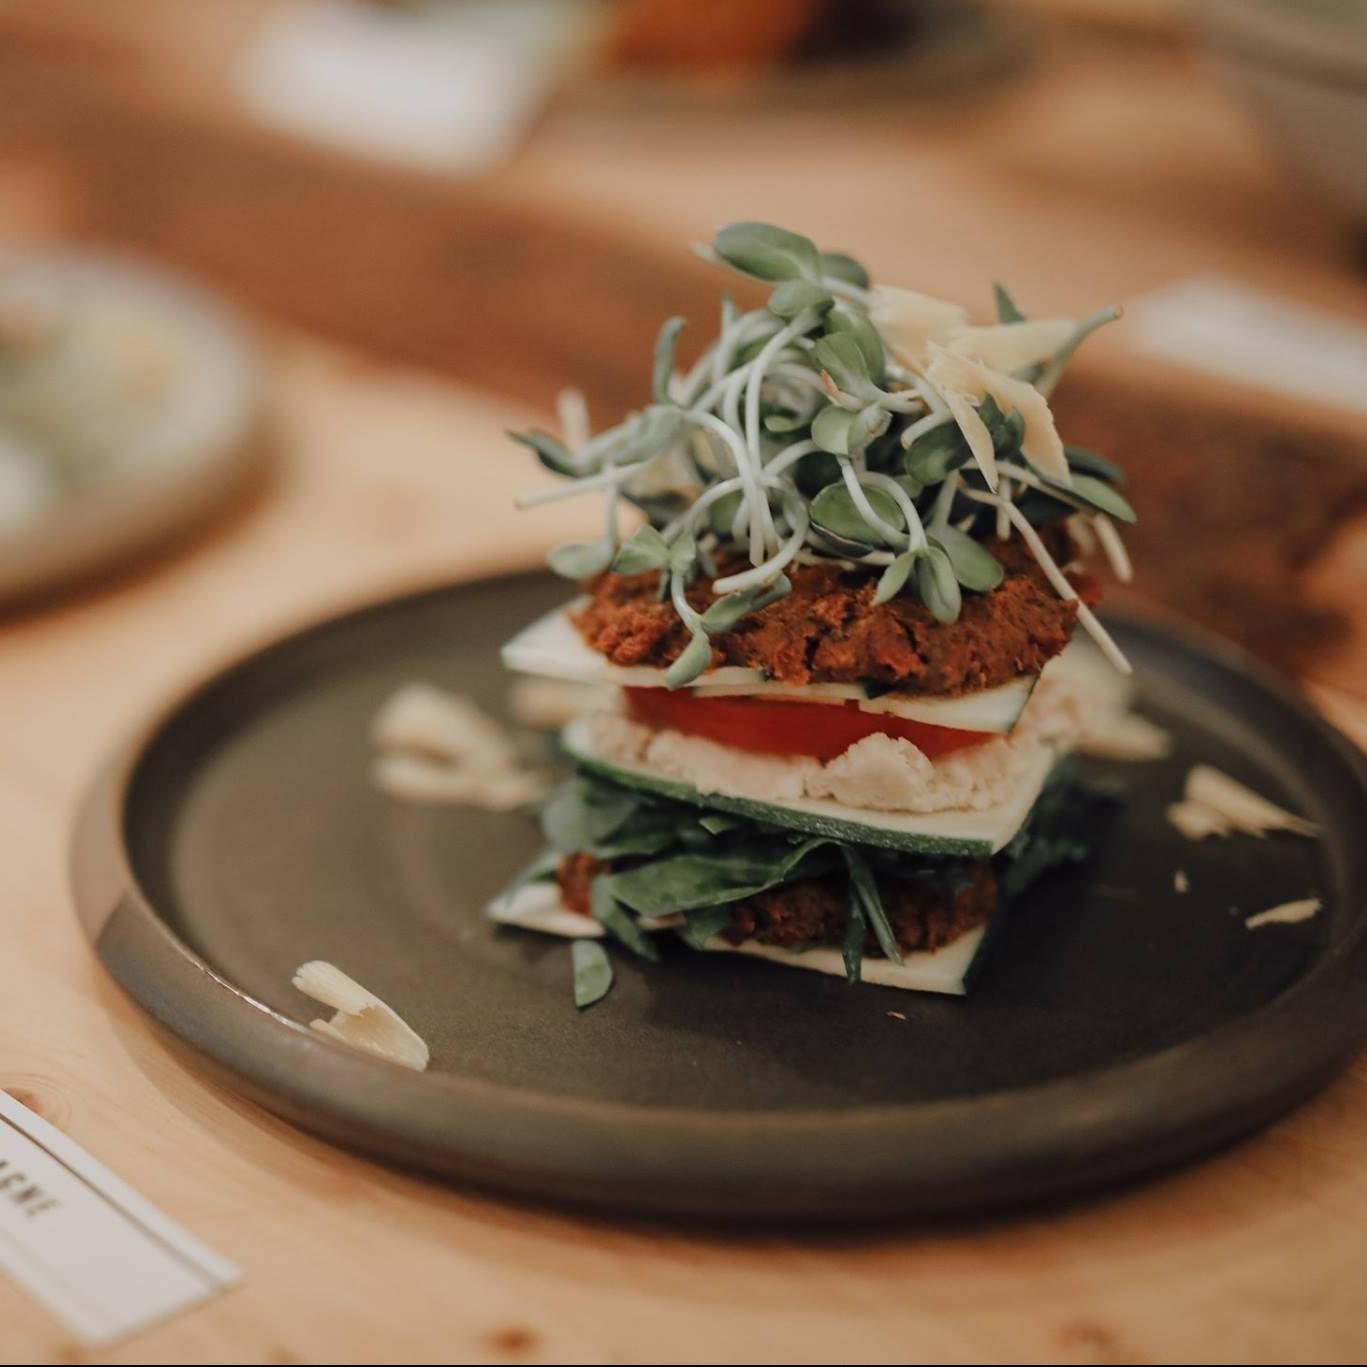 crudessence new menu montreal restaurant vegan (1)